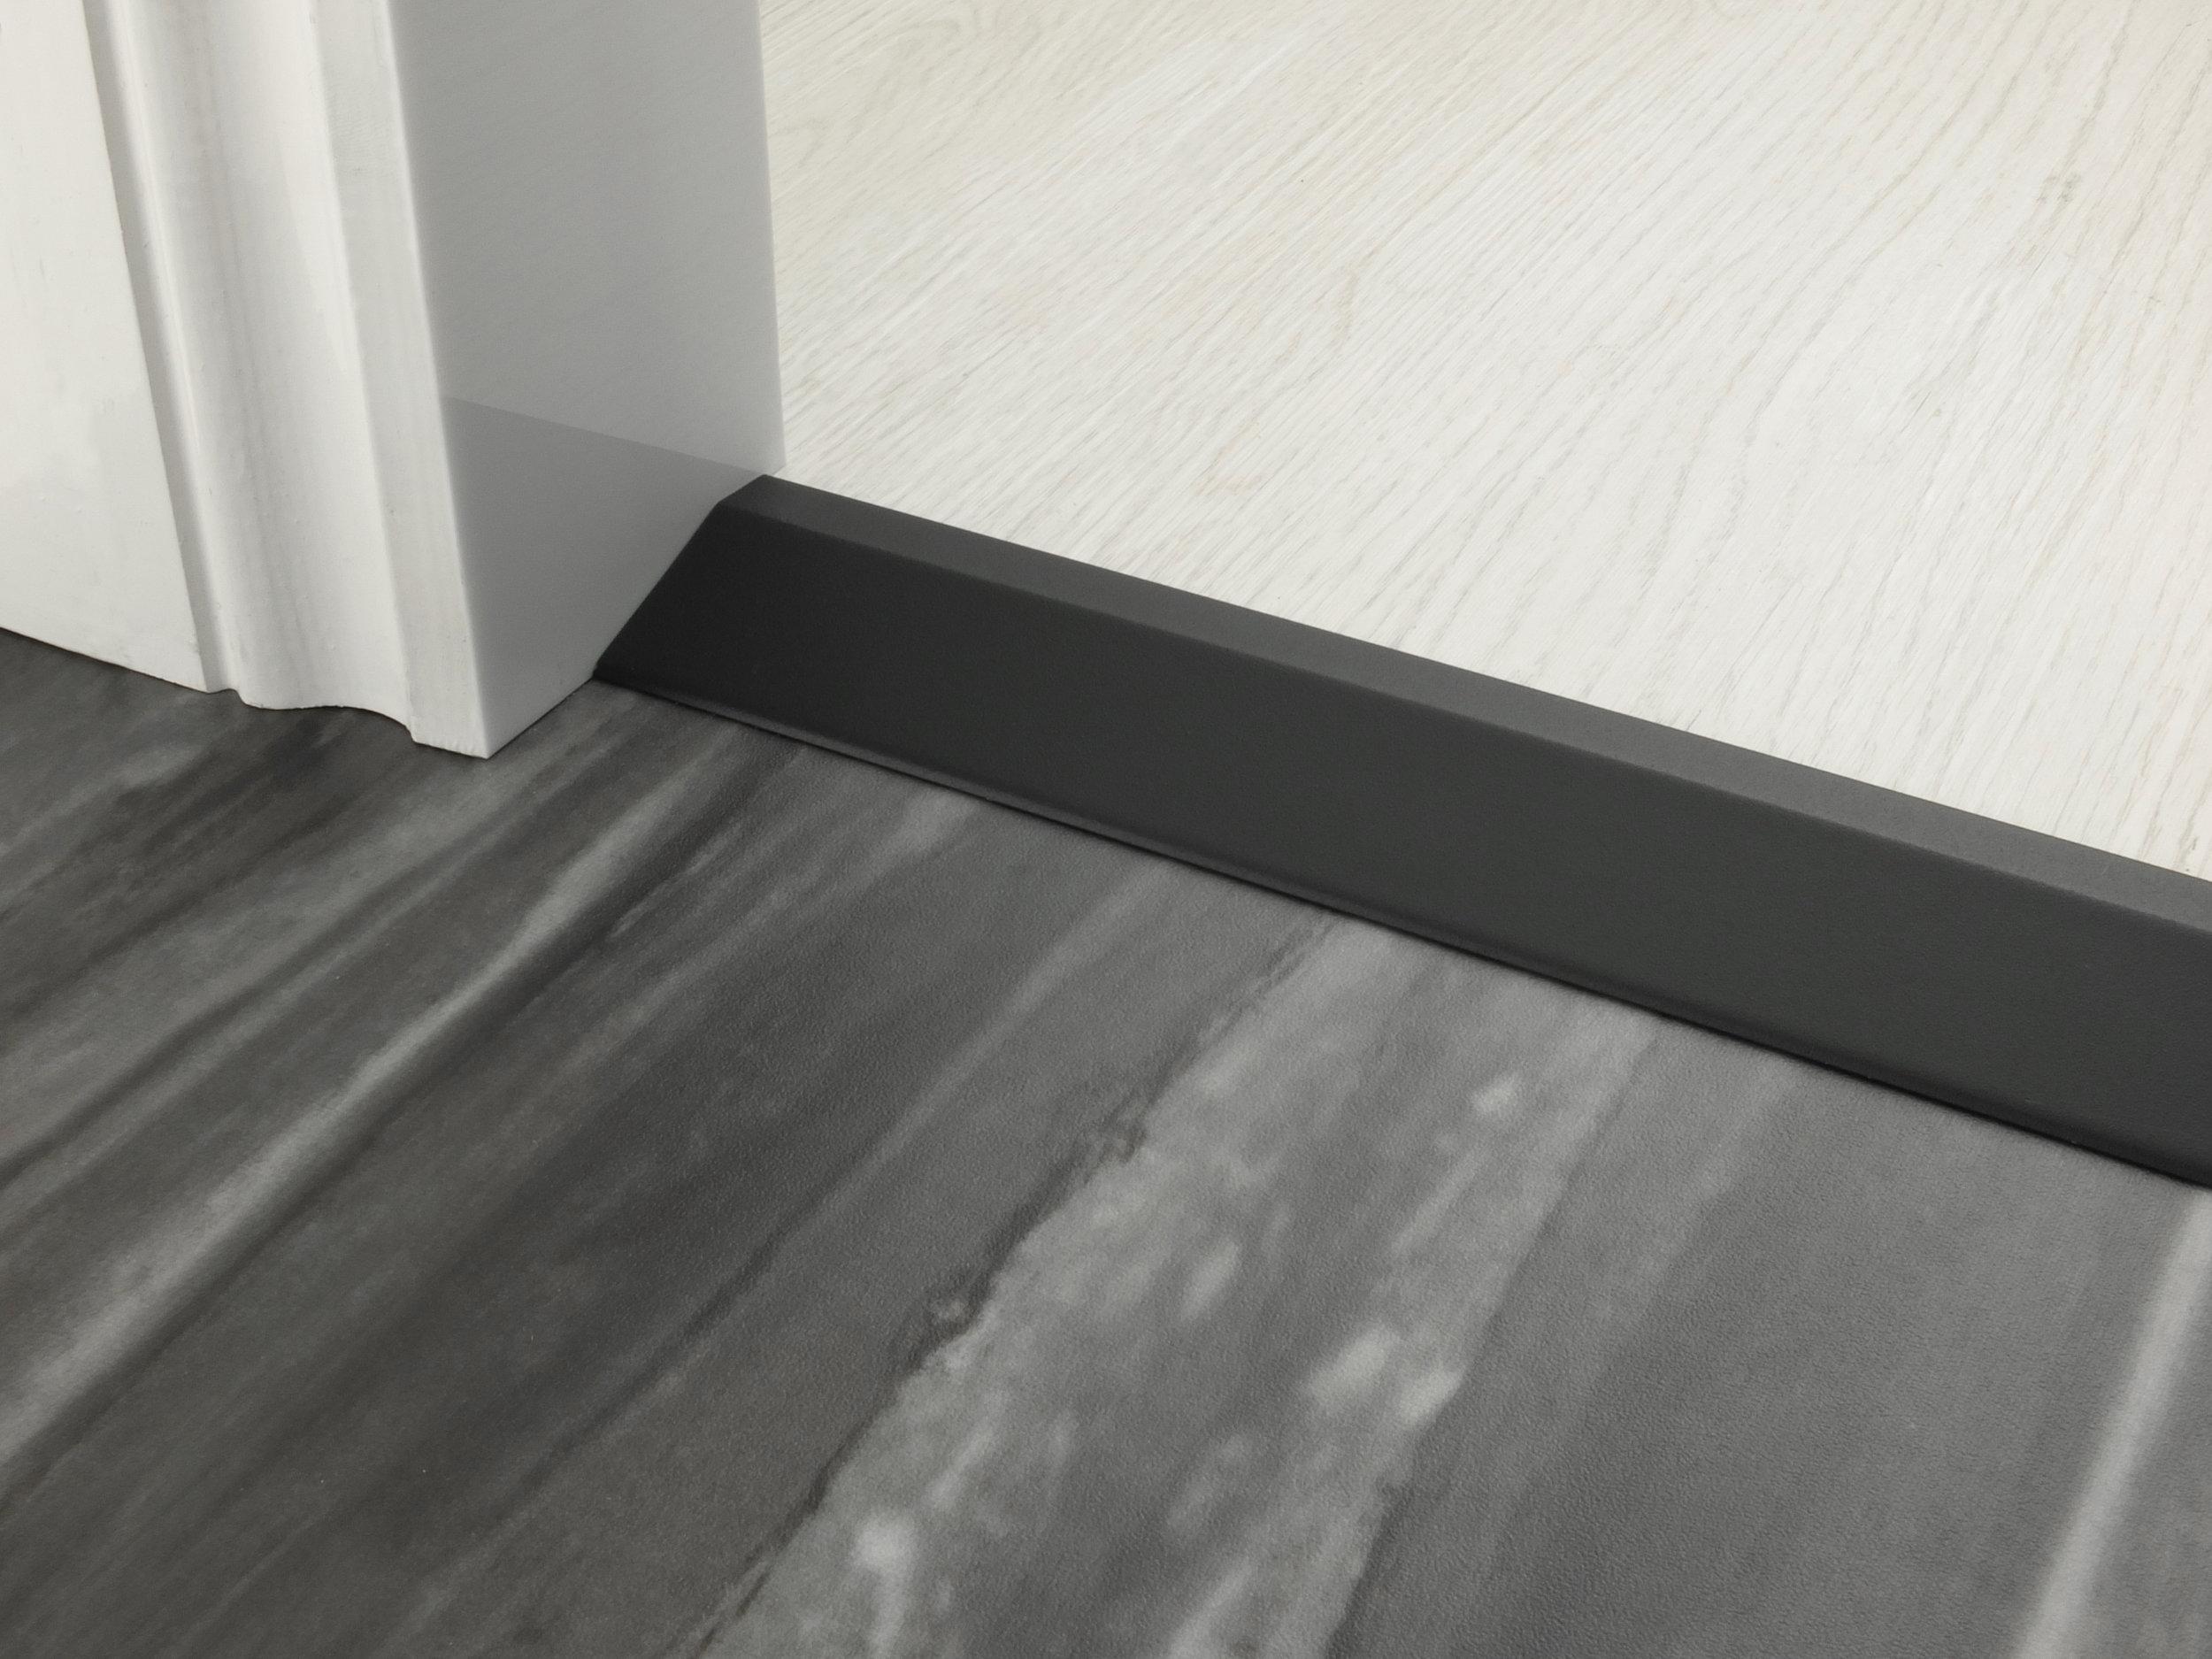 stairrods-doorbar-black-16mm-ramp.jpg